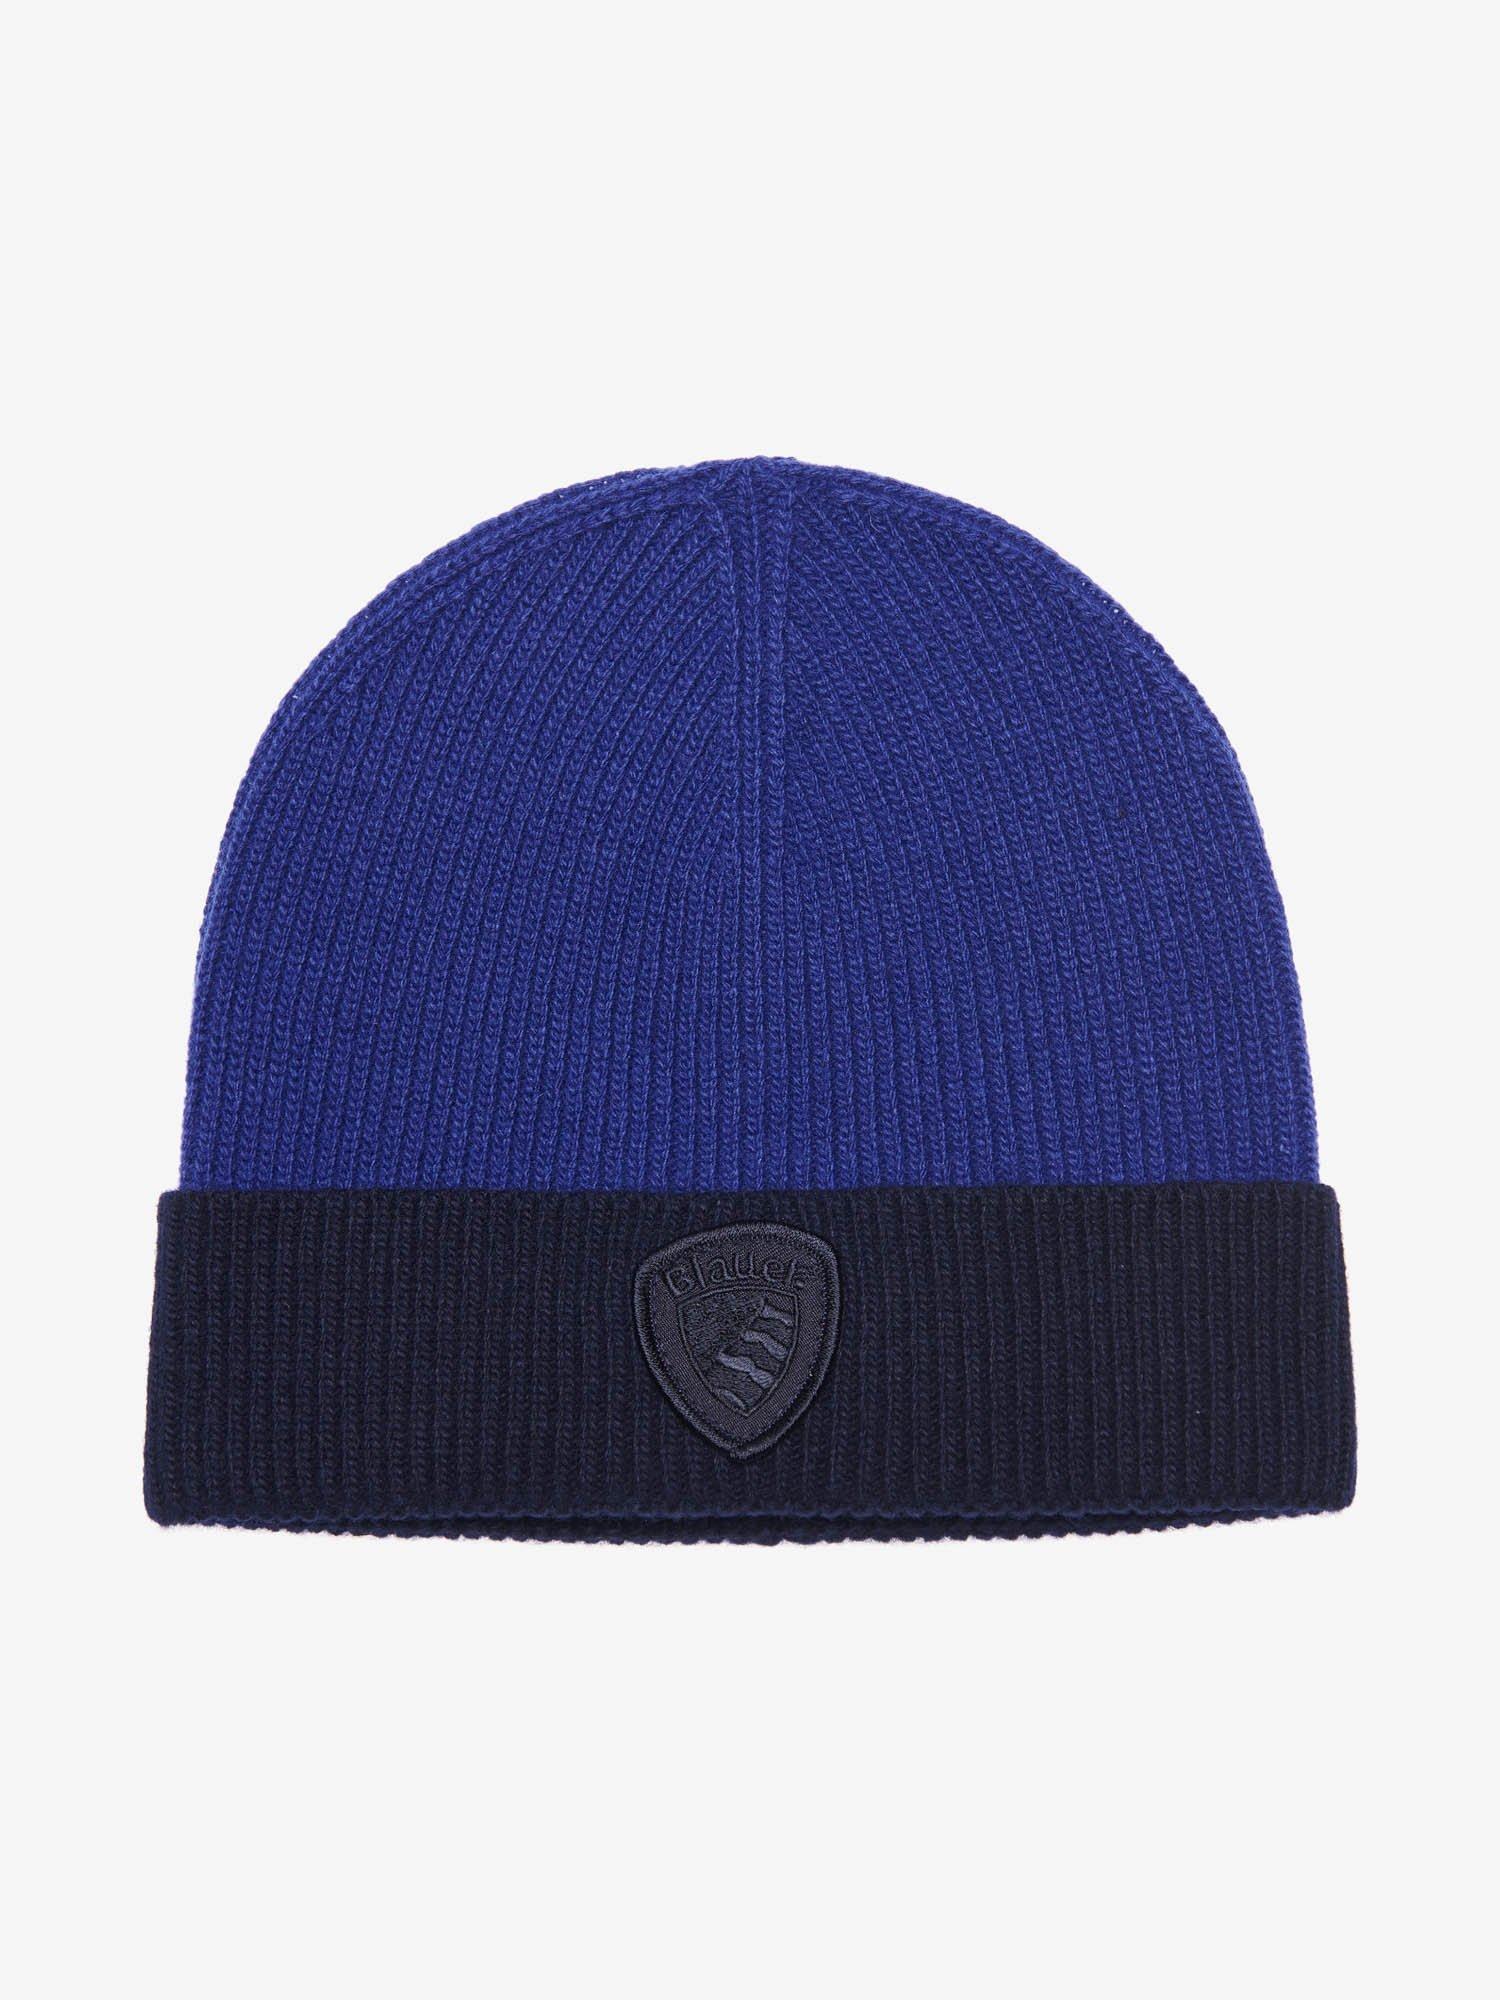 Blauer - TWO-TONE CAP - Bluette - Blauer